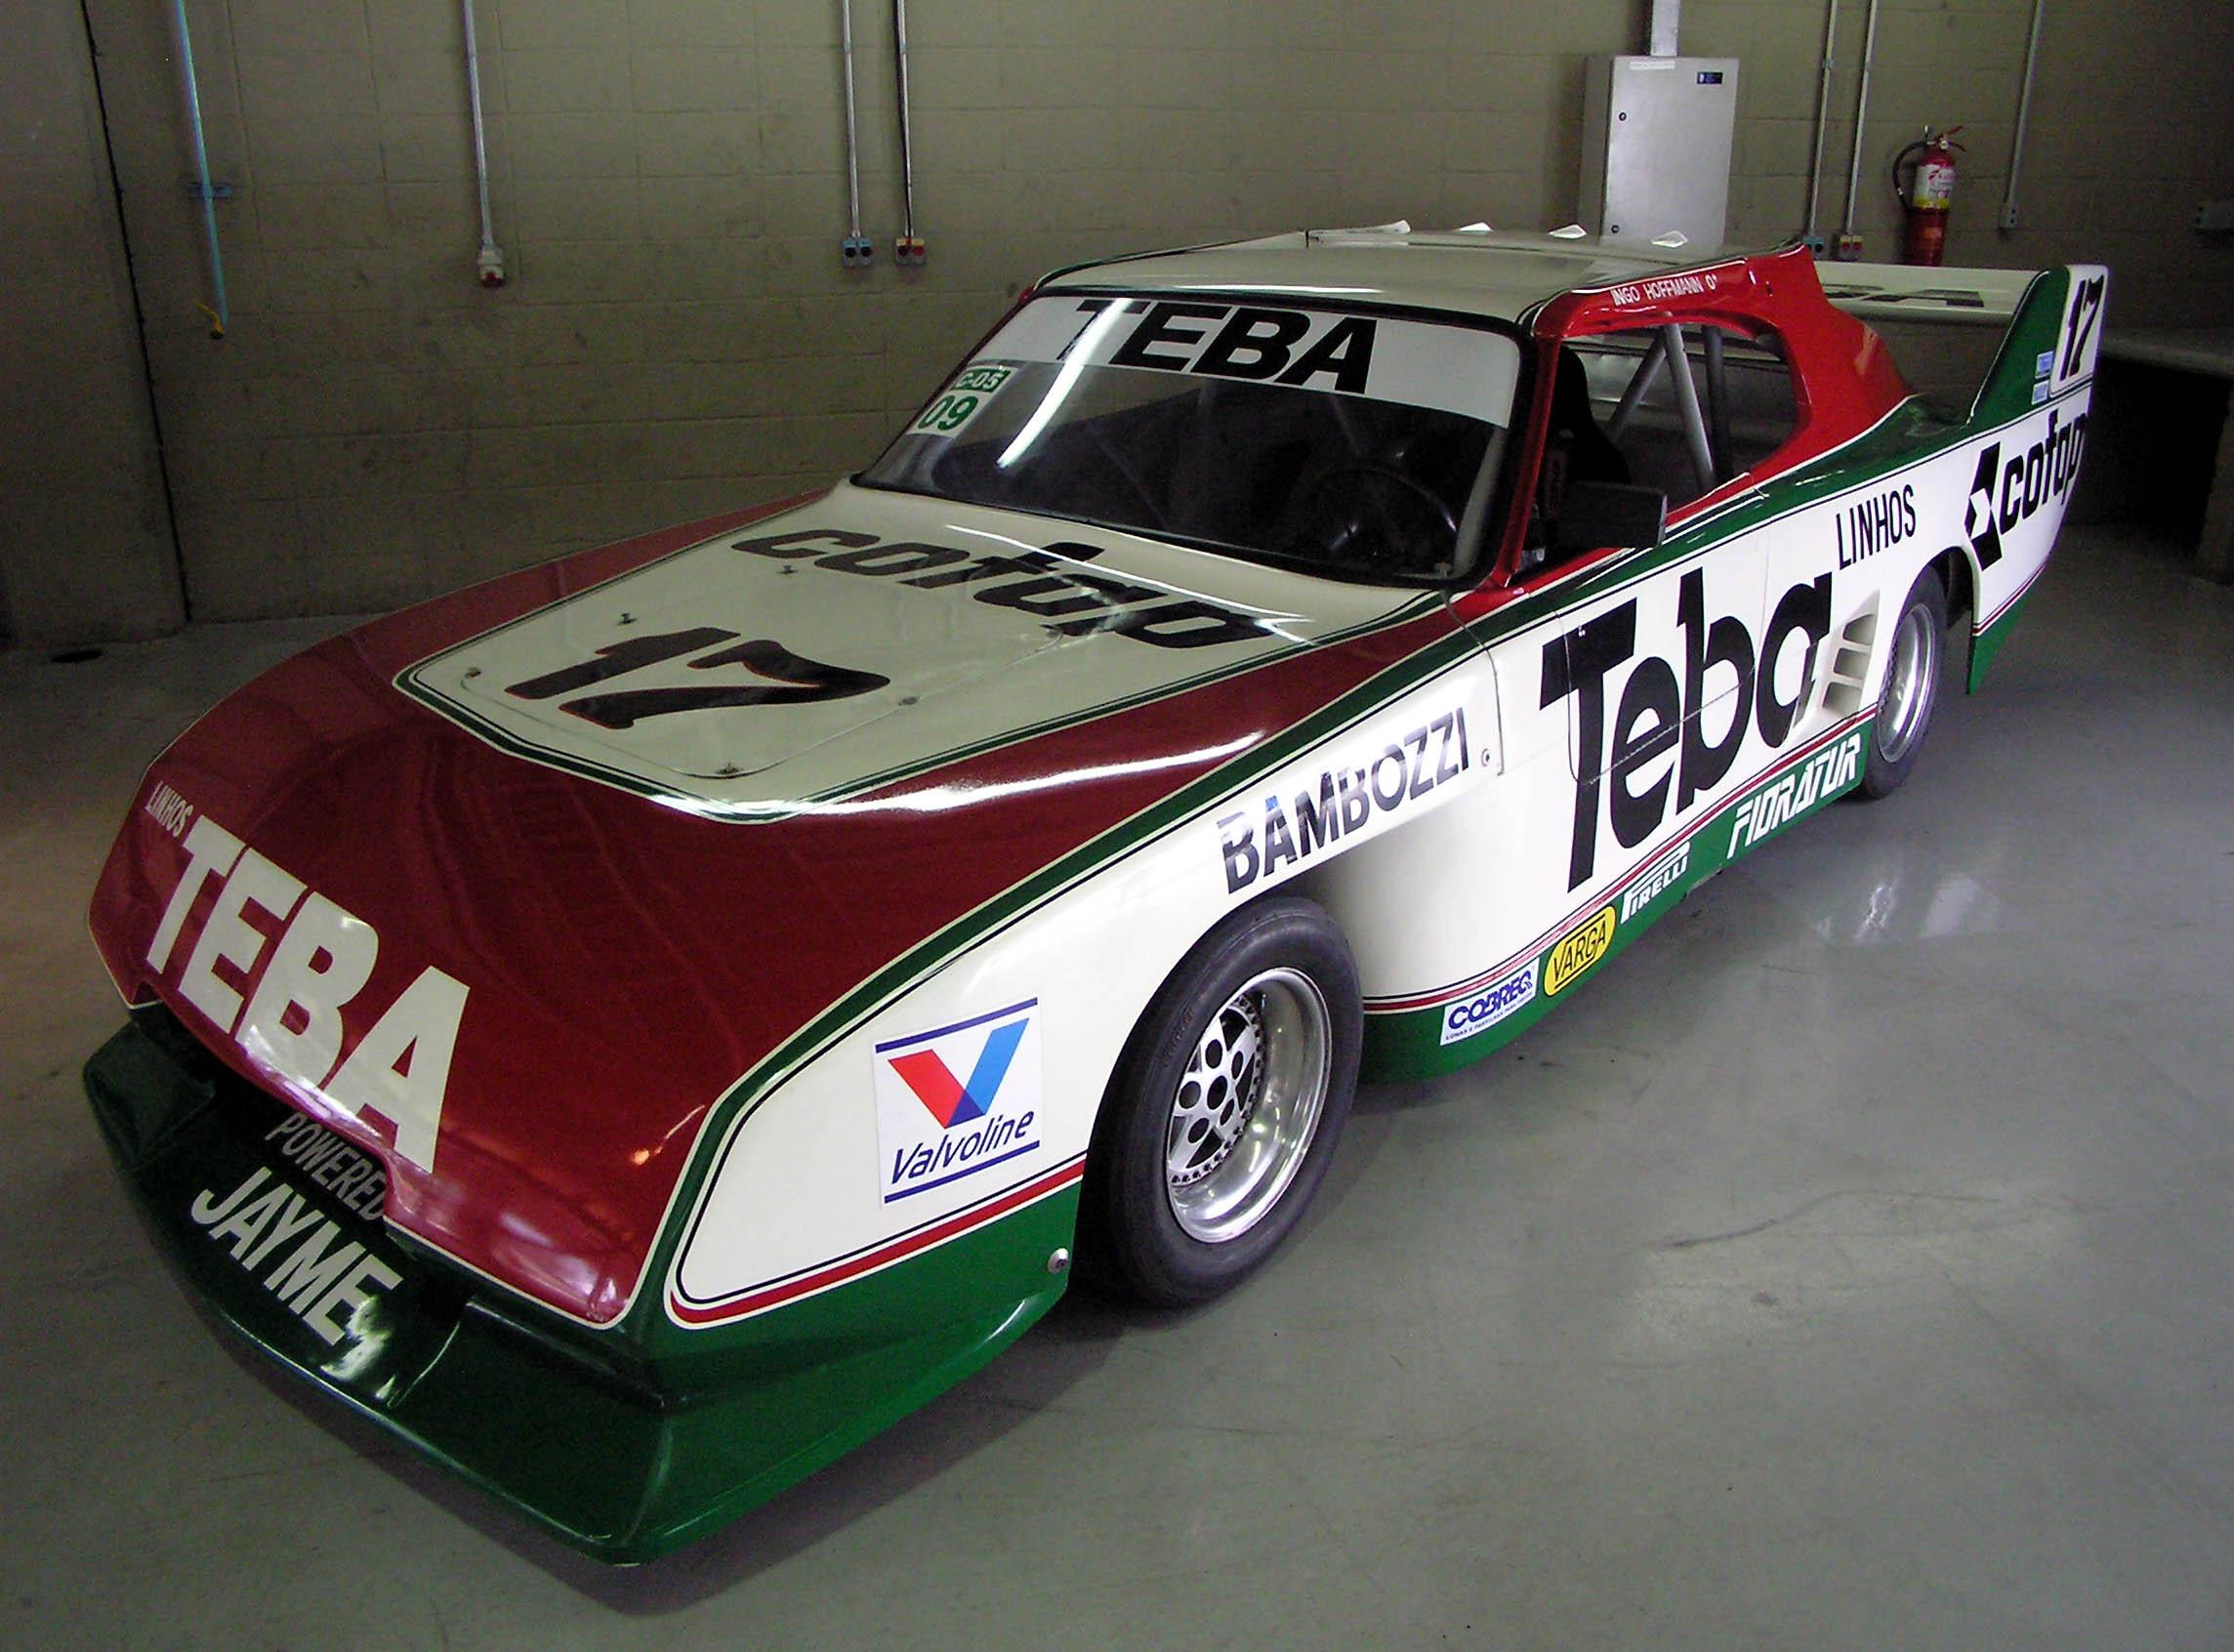 1000 Milhas Brasileiras - 1000 Miles in Brazil 3 Mods from that era Stock_Car_Brasil_1988_Chevrolet_Opala_Ingo_Hoffman